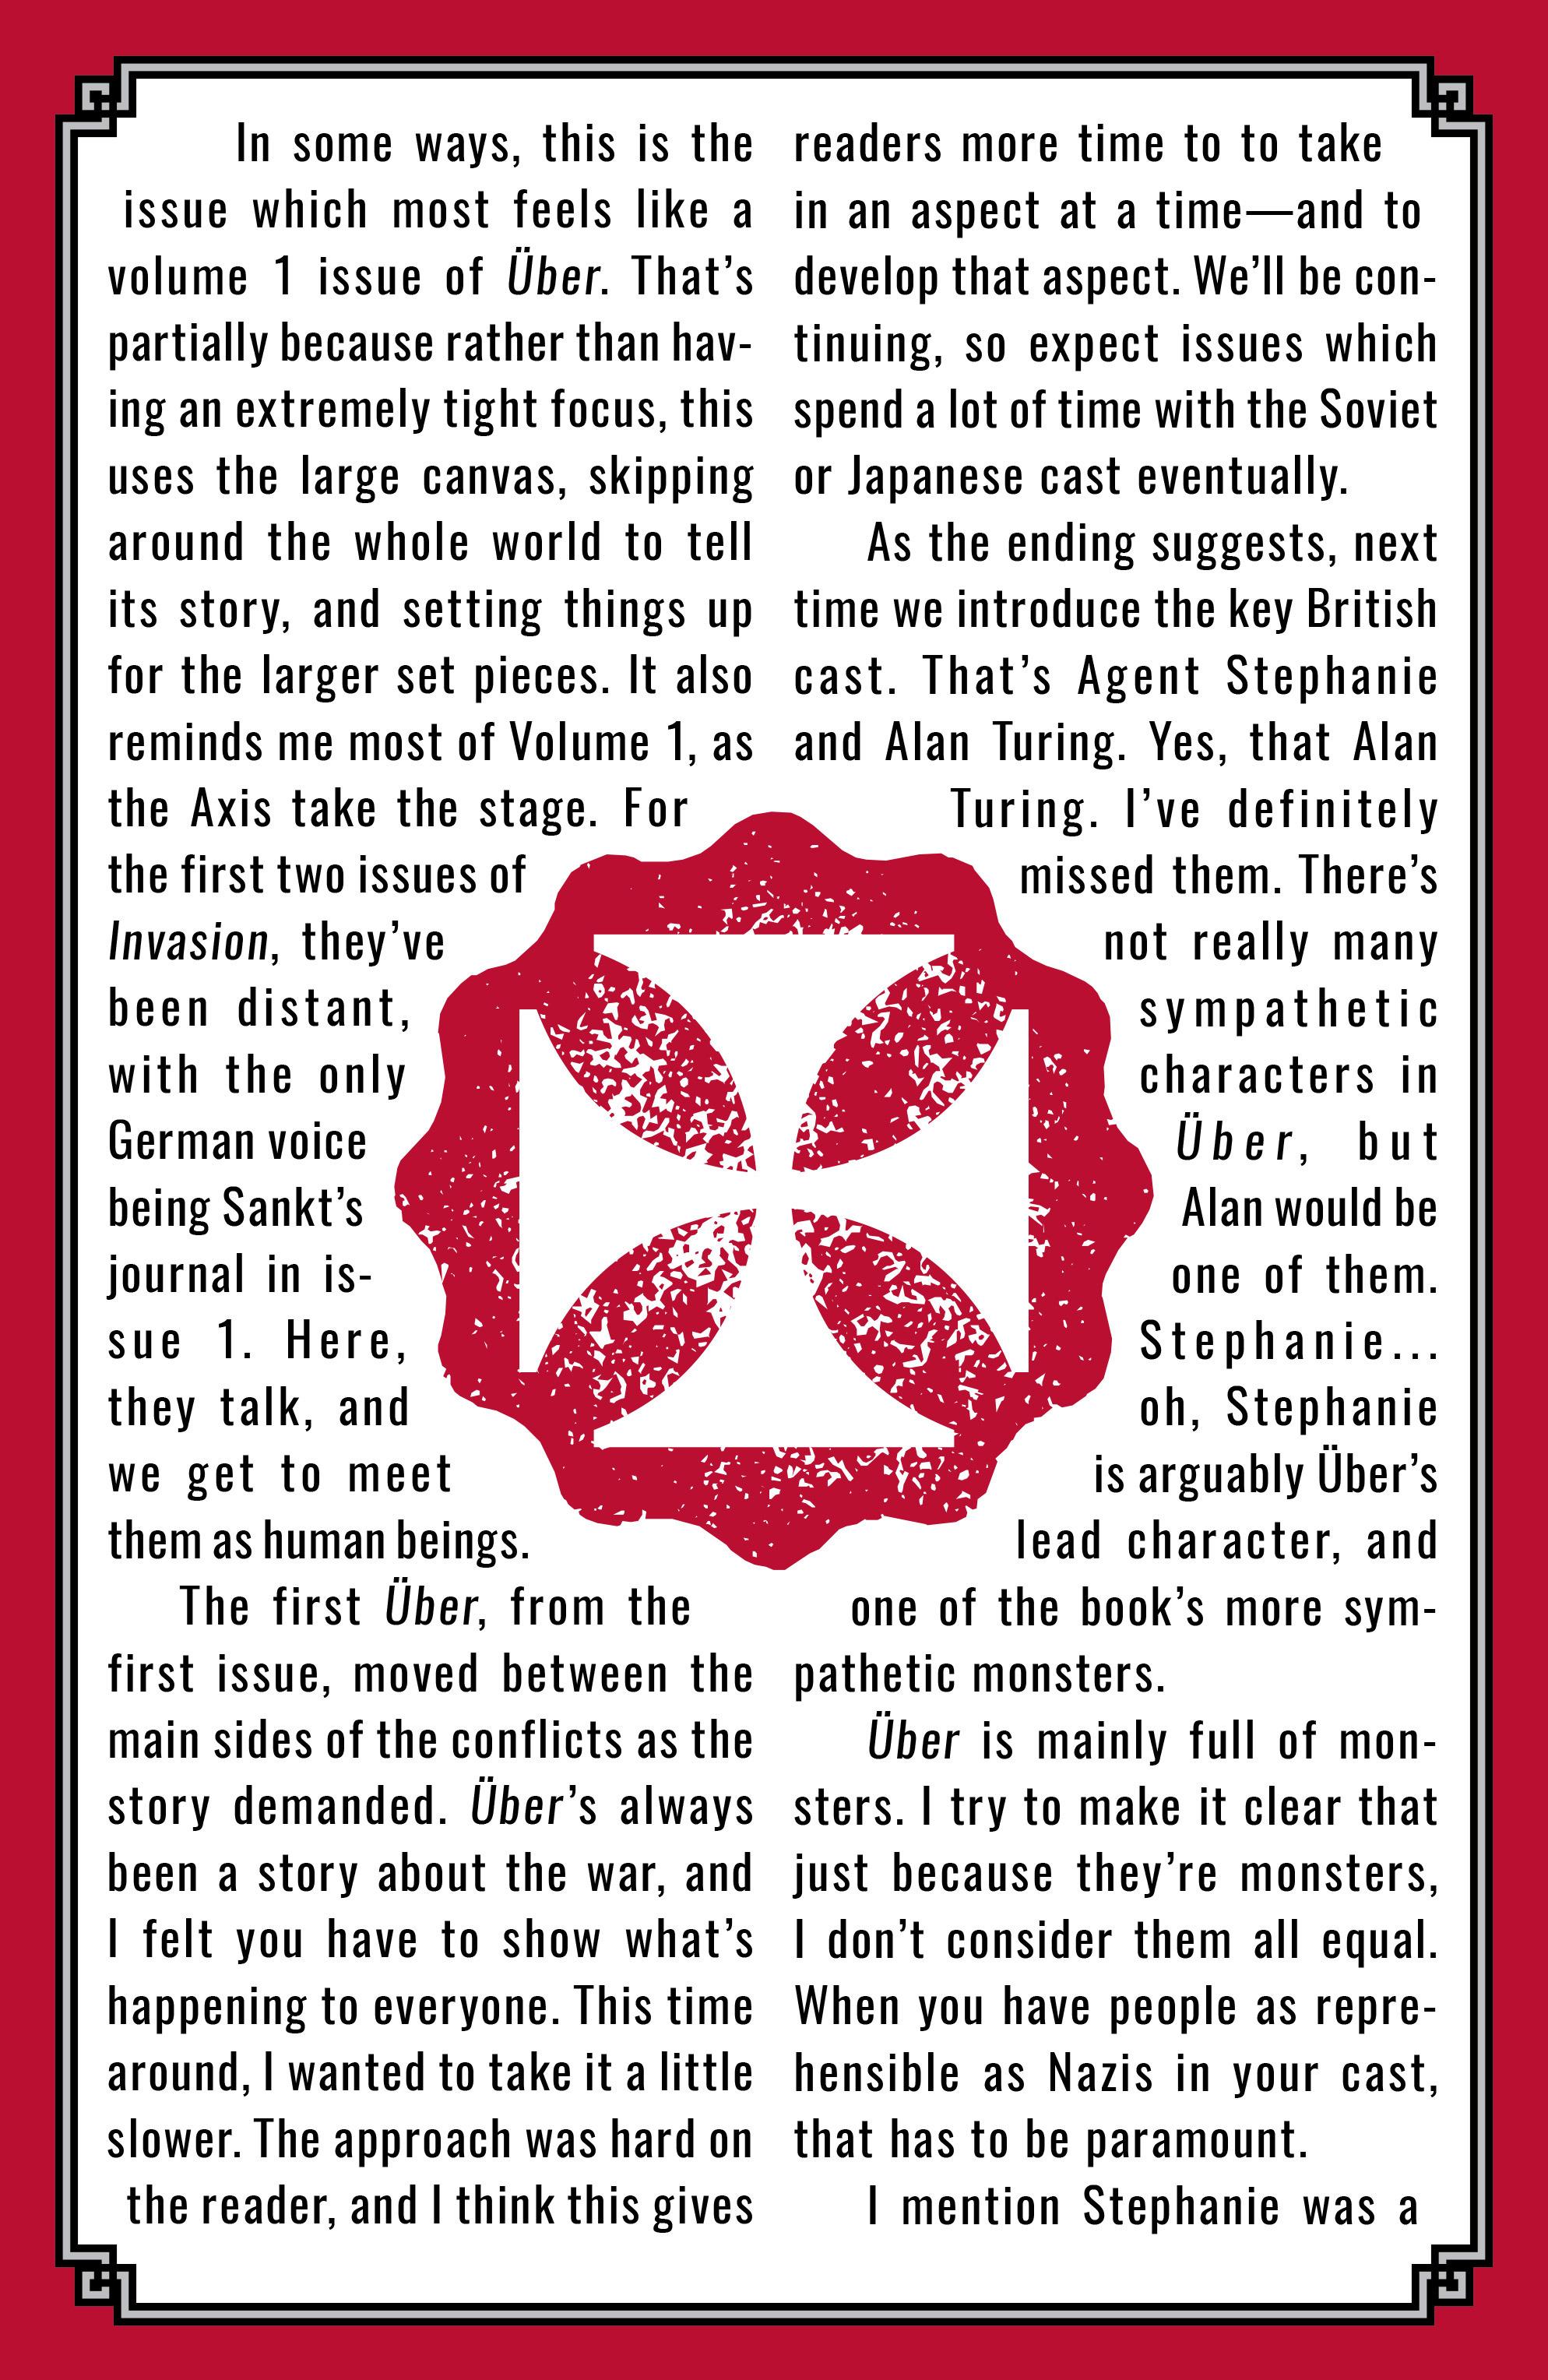 Read online Uber: Invasion comic -  Issue #3 - 26